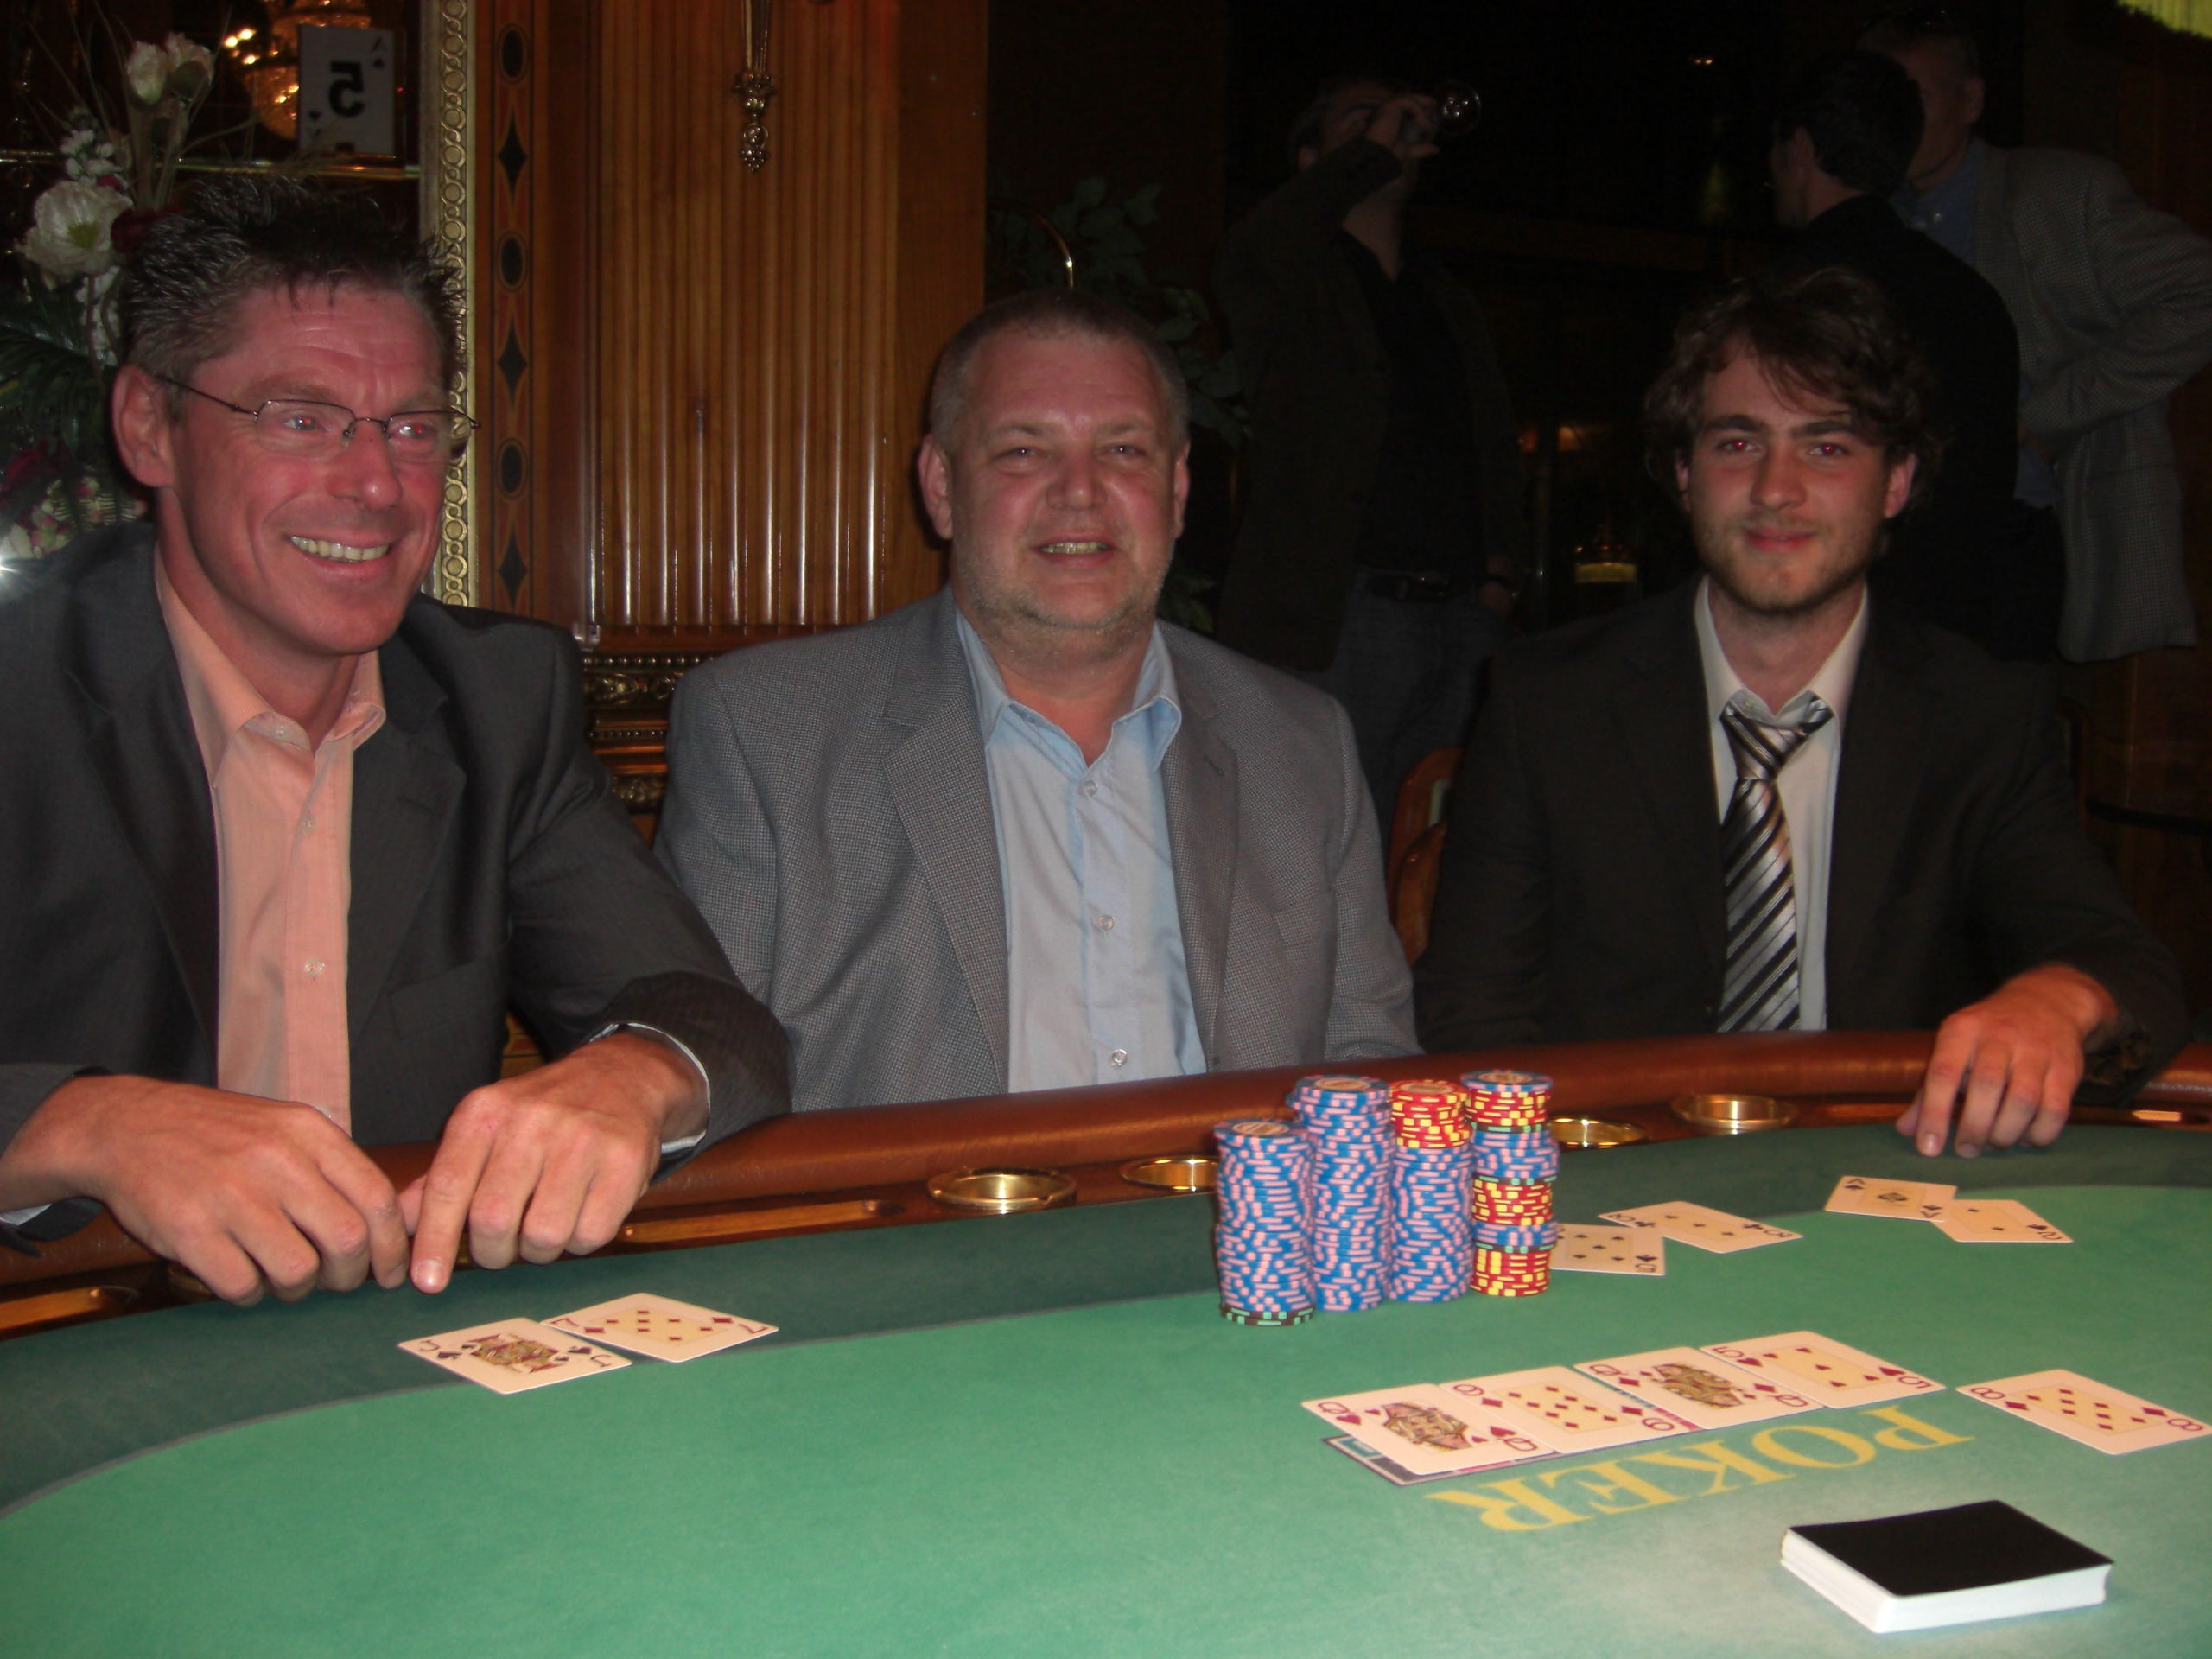 Casino Wiesbaden Erfahrungen